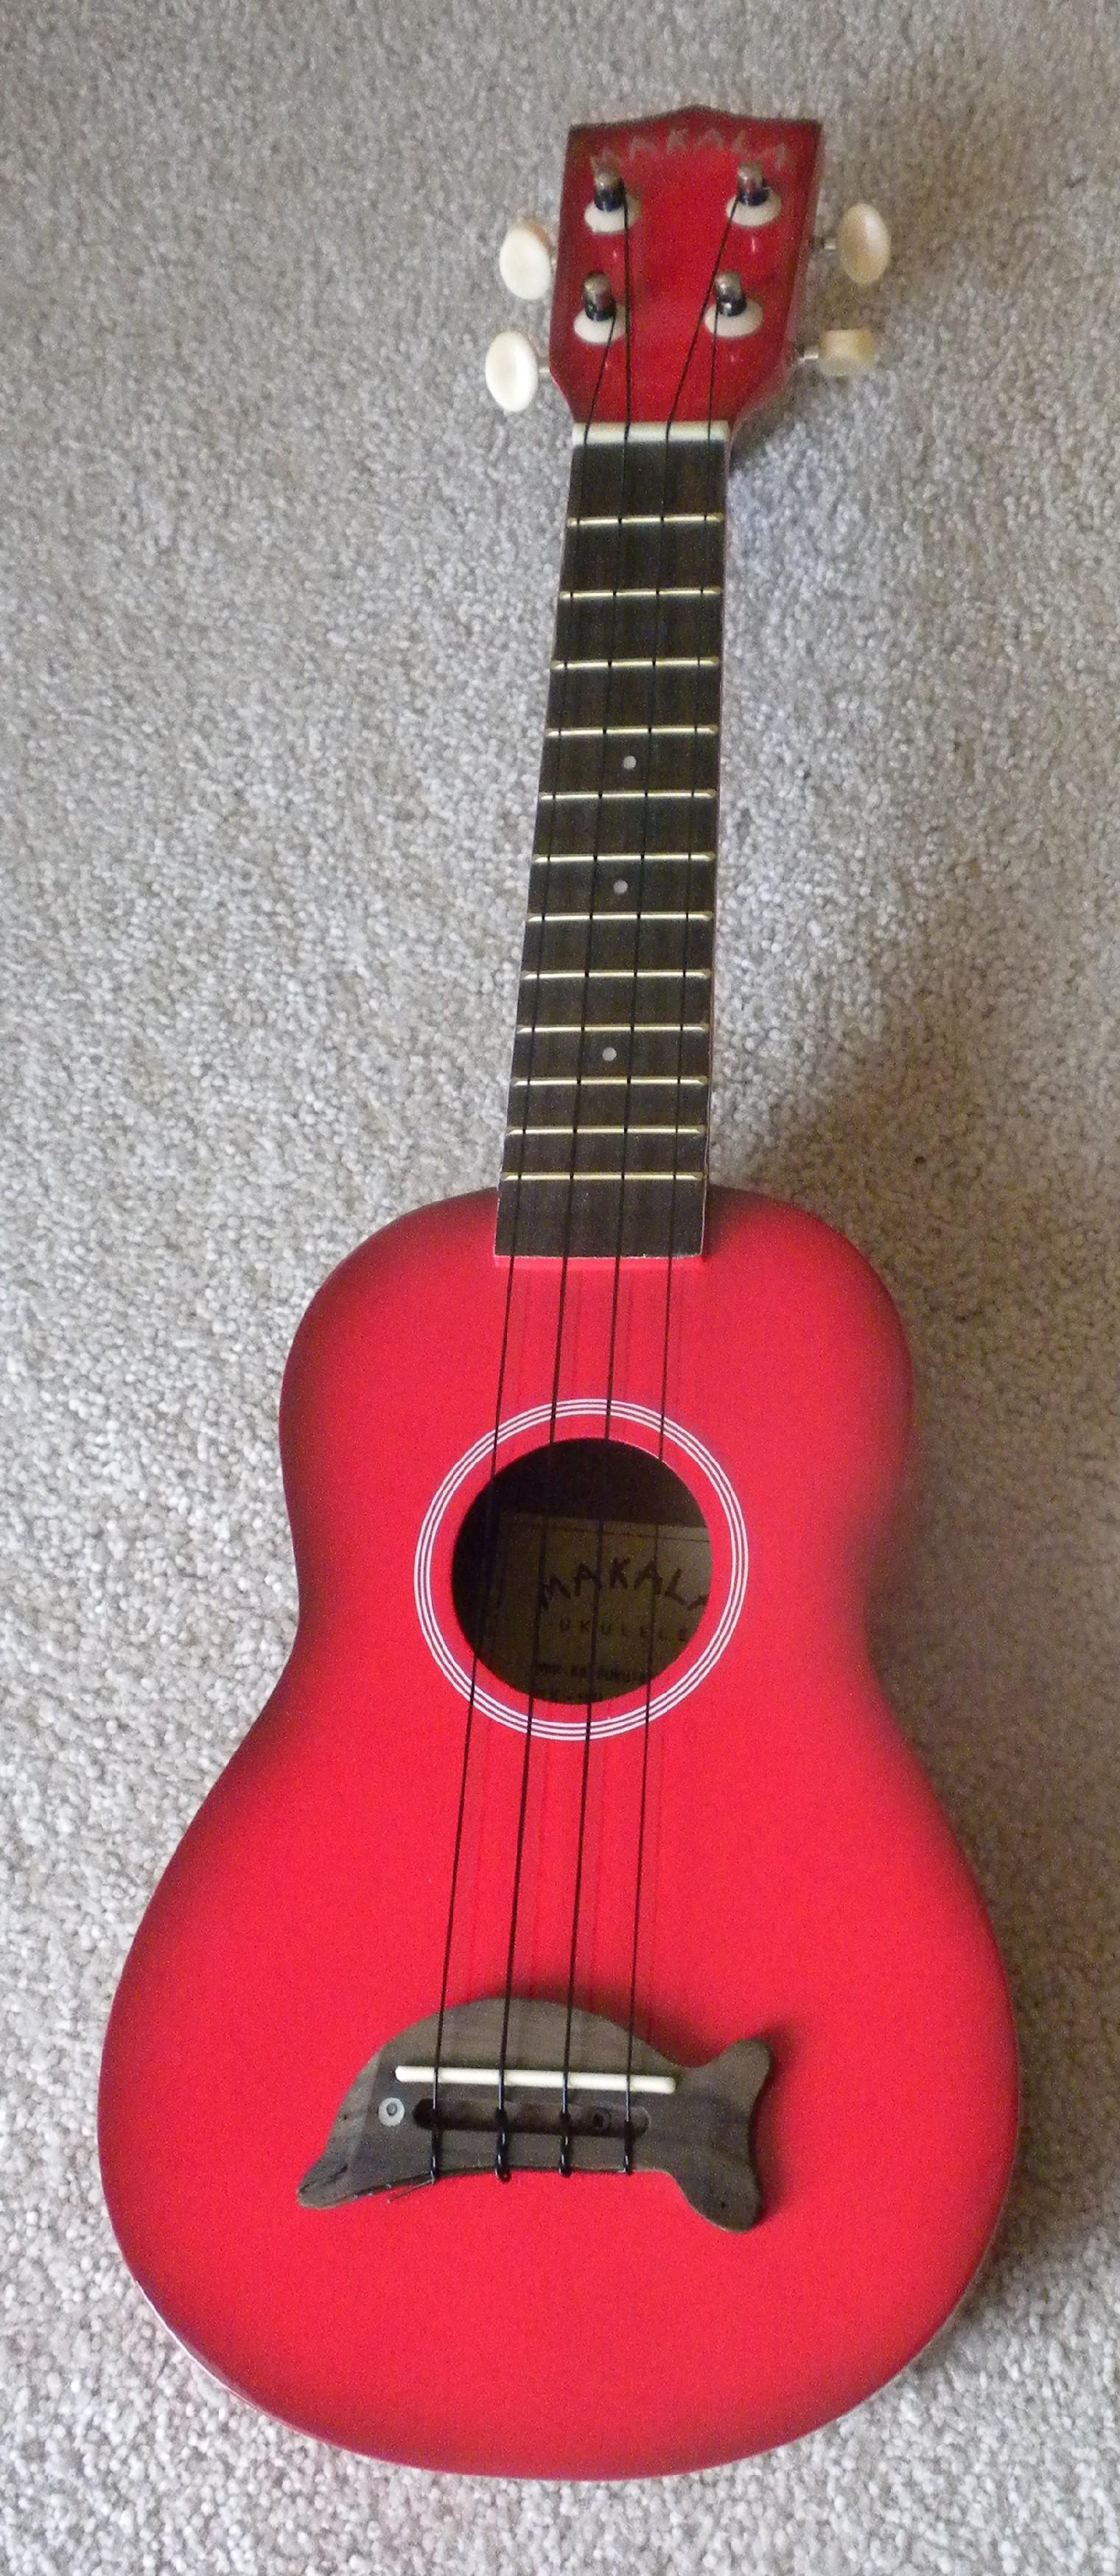 dating harmoni baryton ukulele dating sjarm armbånd historien